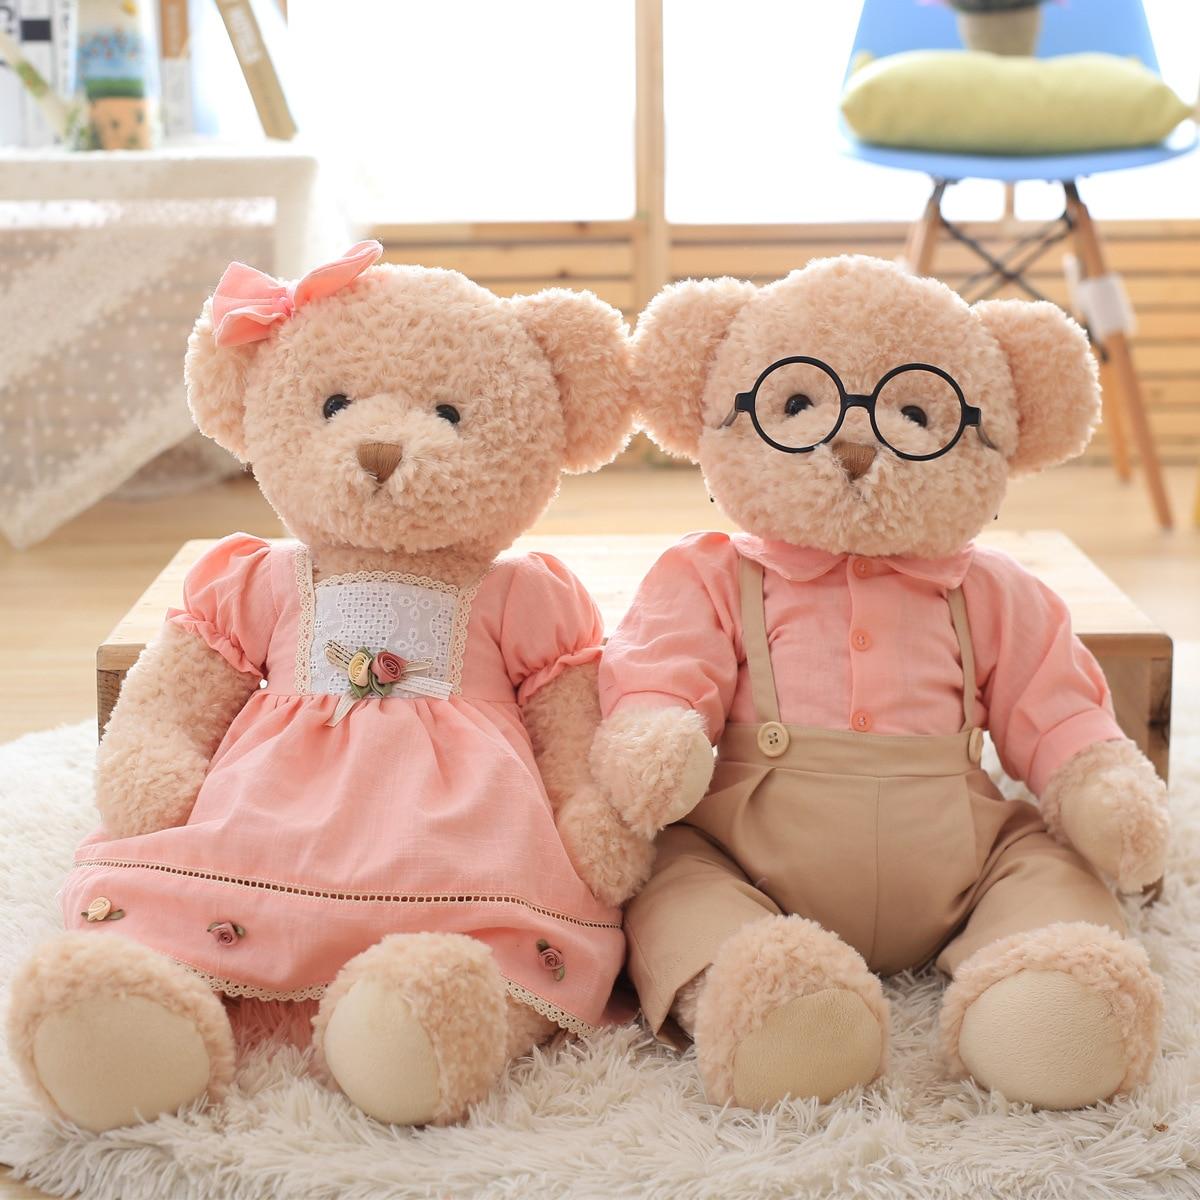 Gambar Boneka Lucu Couple Gambar Ngakak